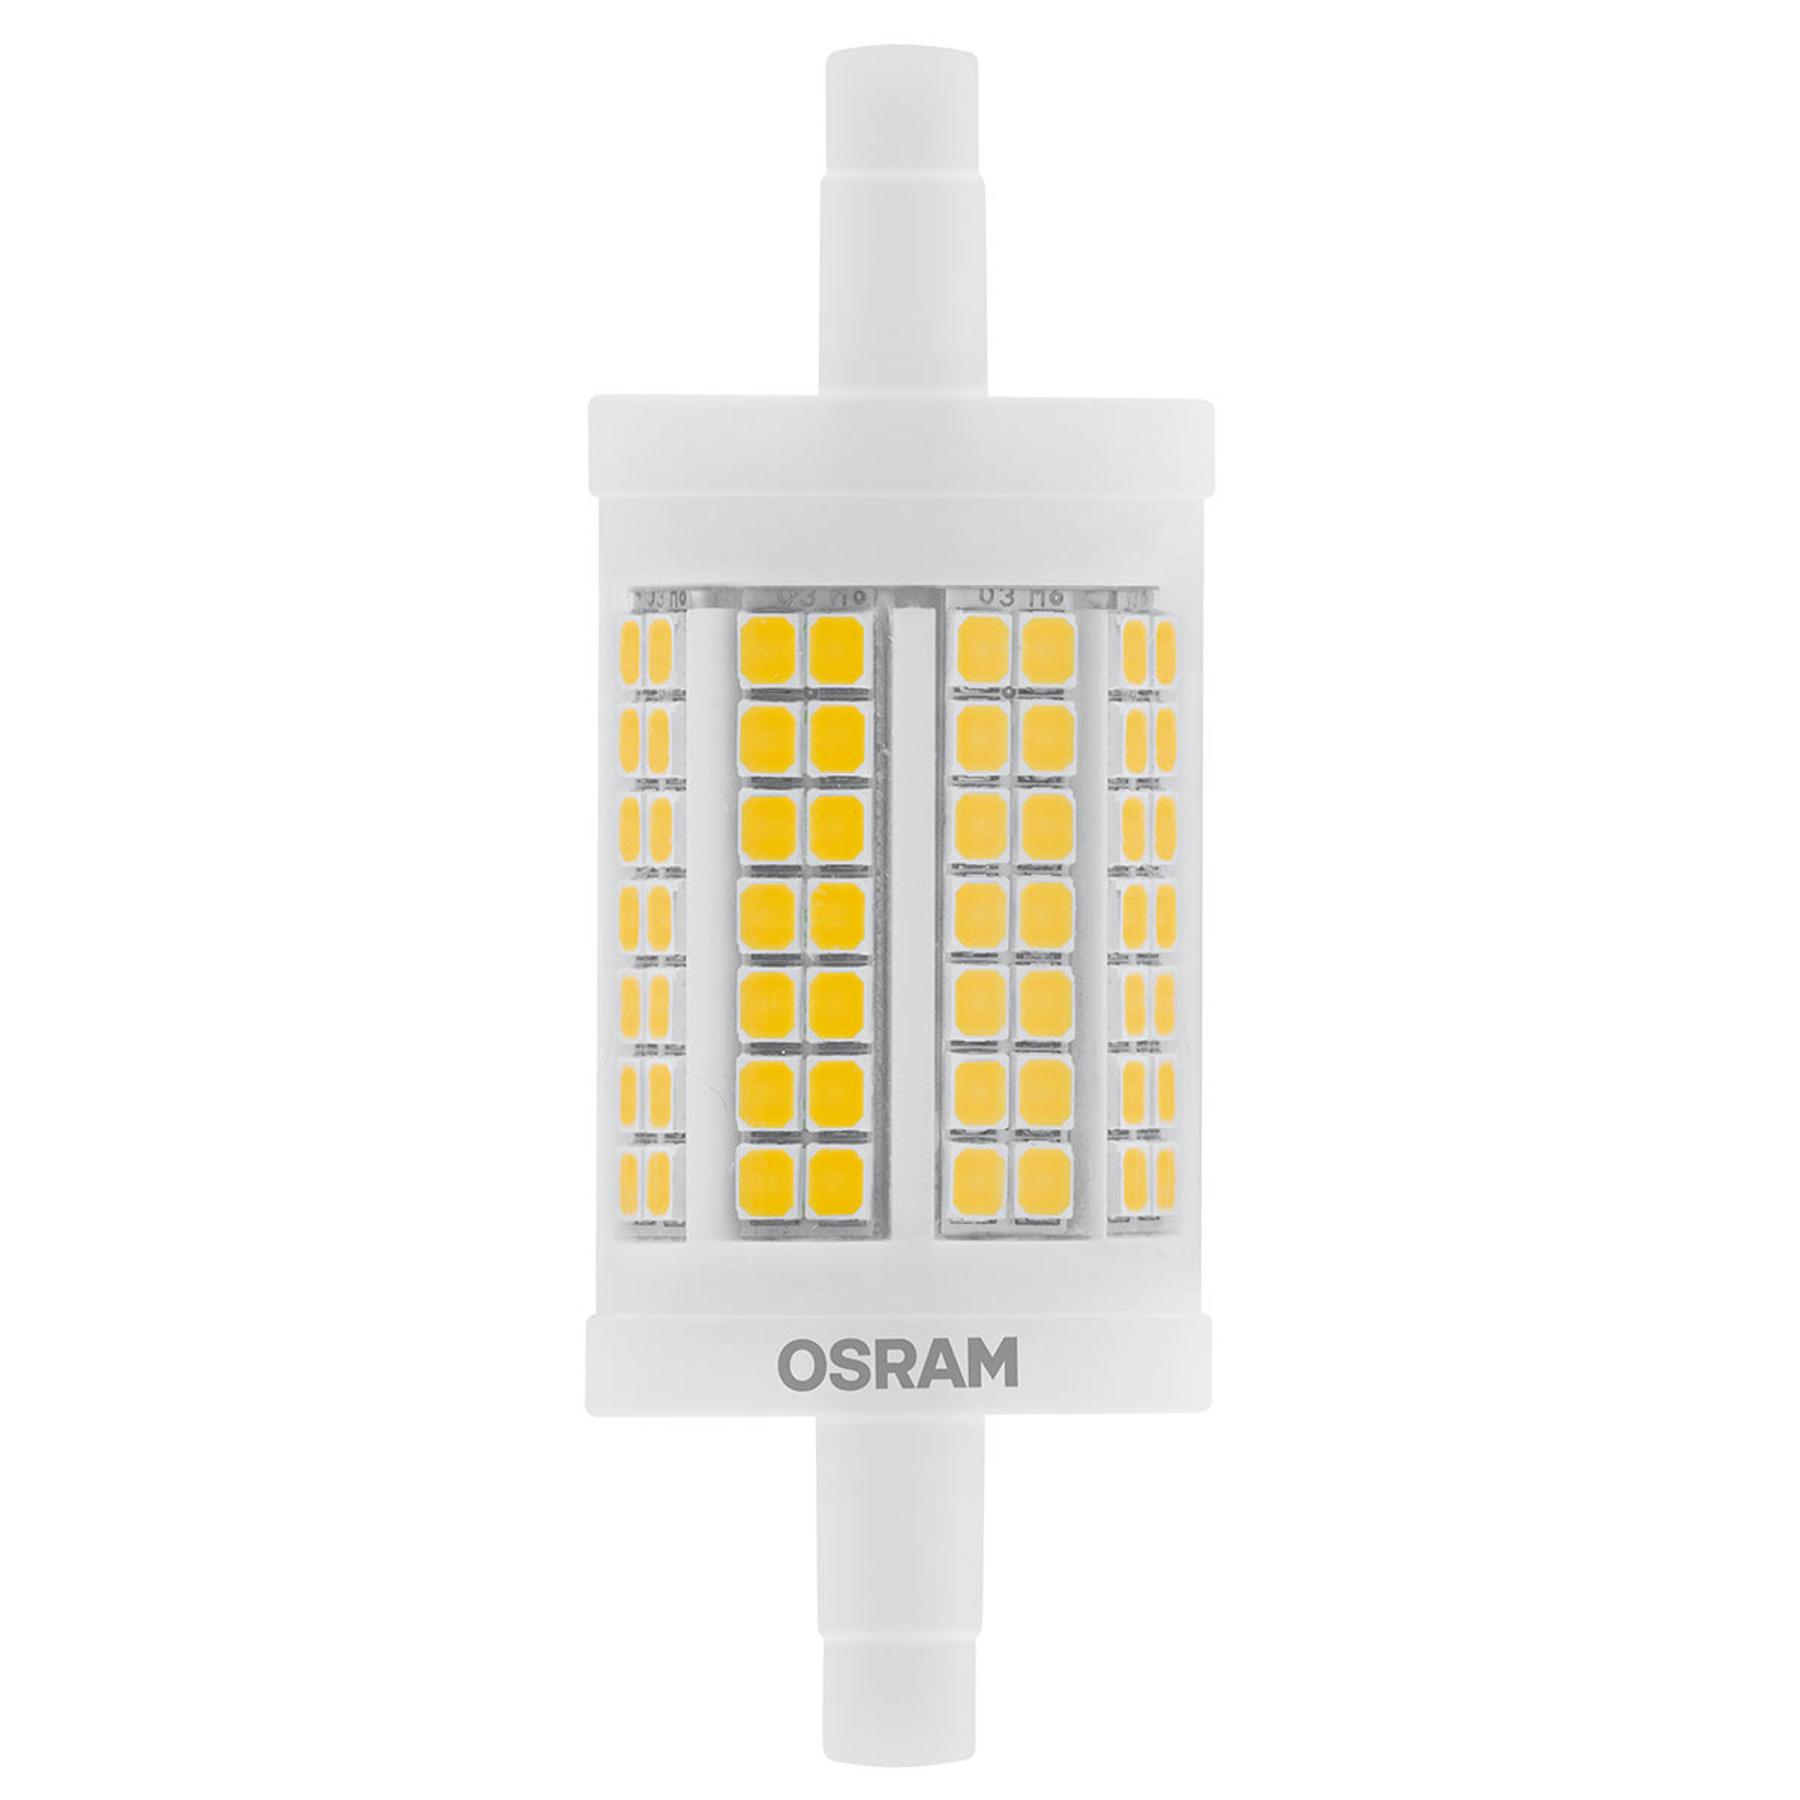 OSRAM-LED-putkilamppu R7s 11,5W 7,8cm 827 dim